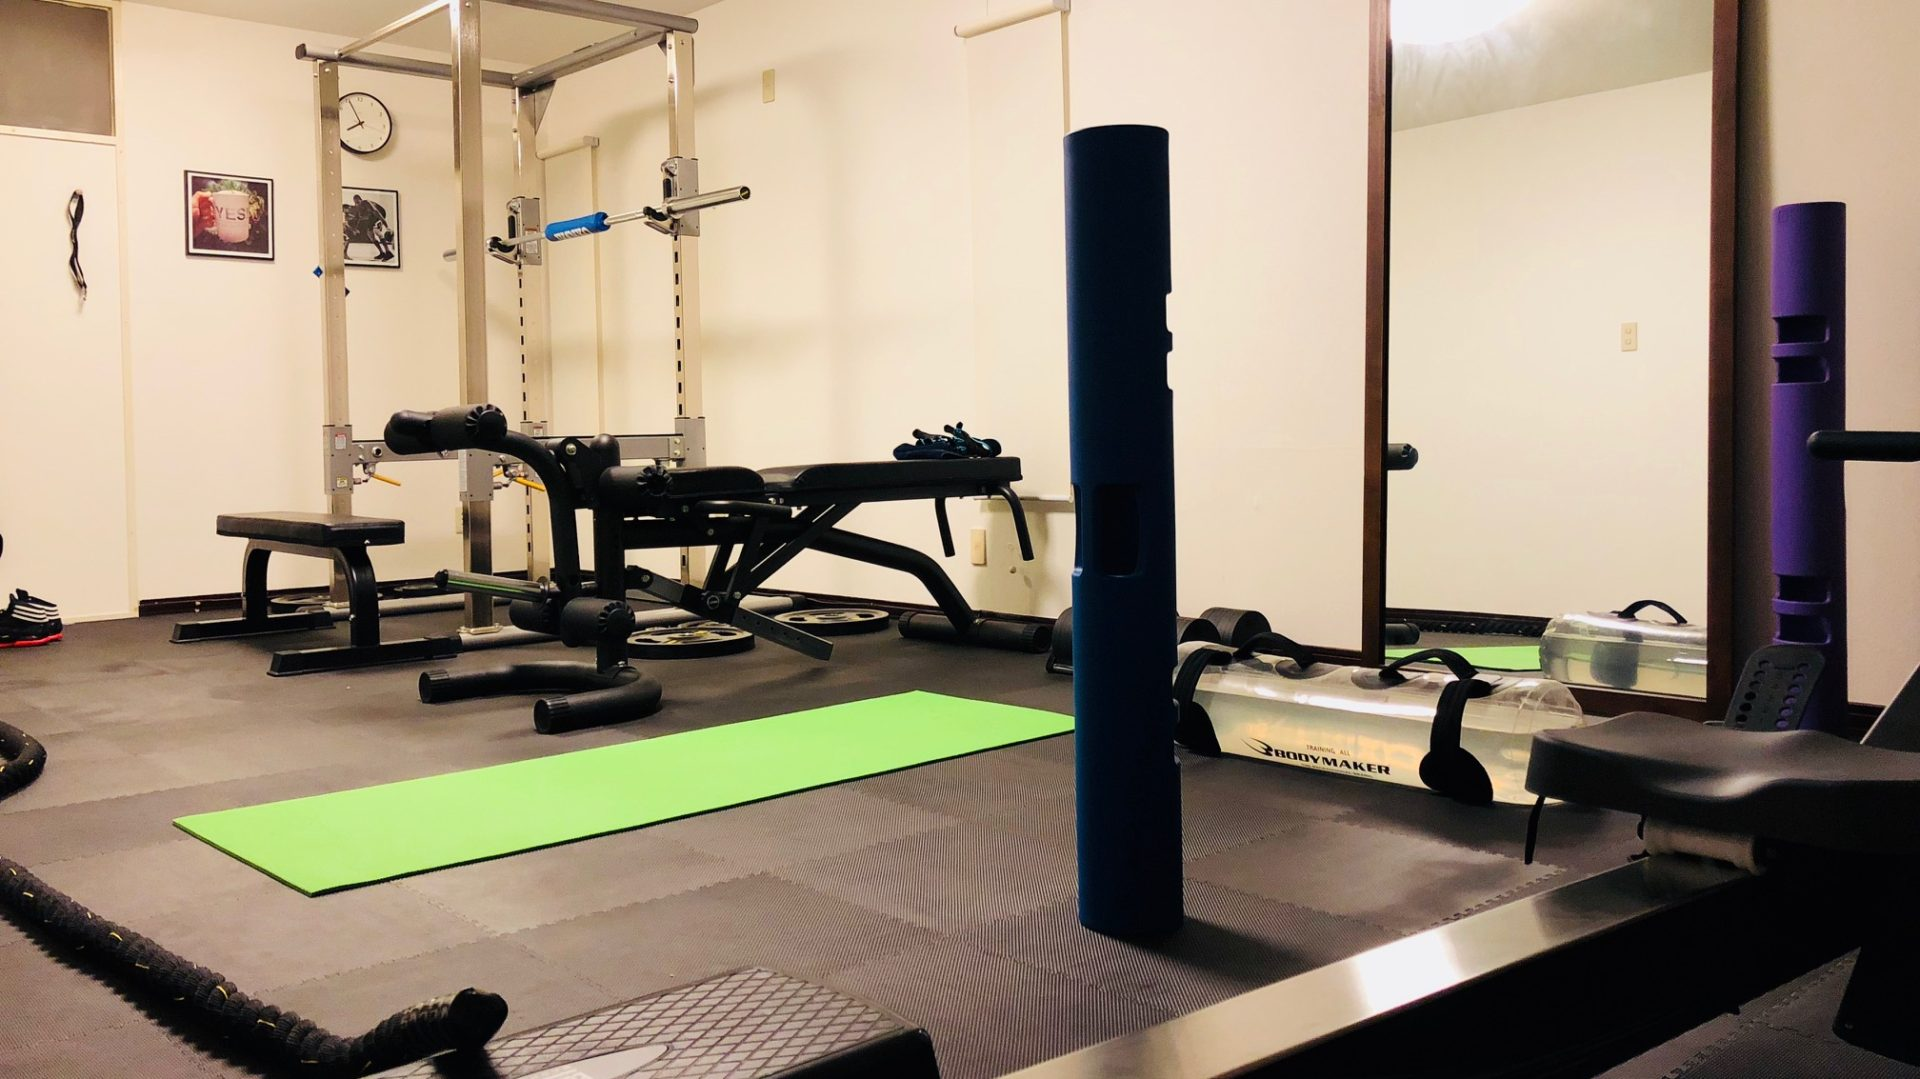 BODY MAKE STUDIO GORILLA|奈良県生駒市のパーソナルトレーニングスタジオ